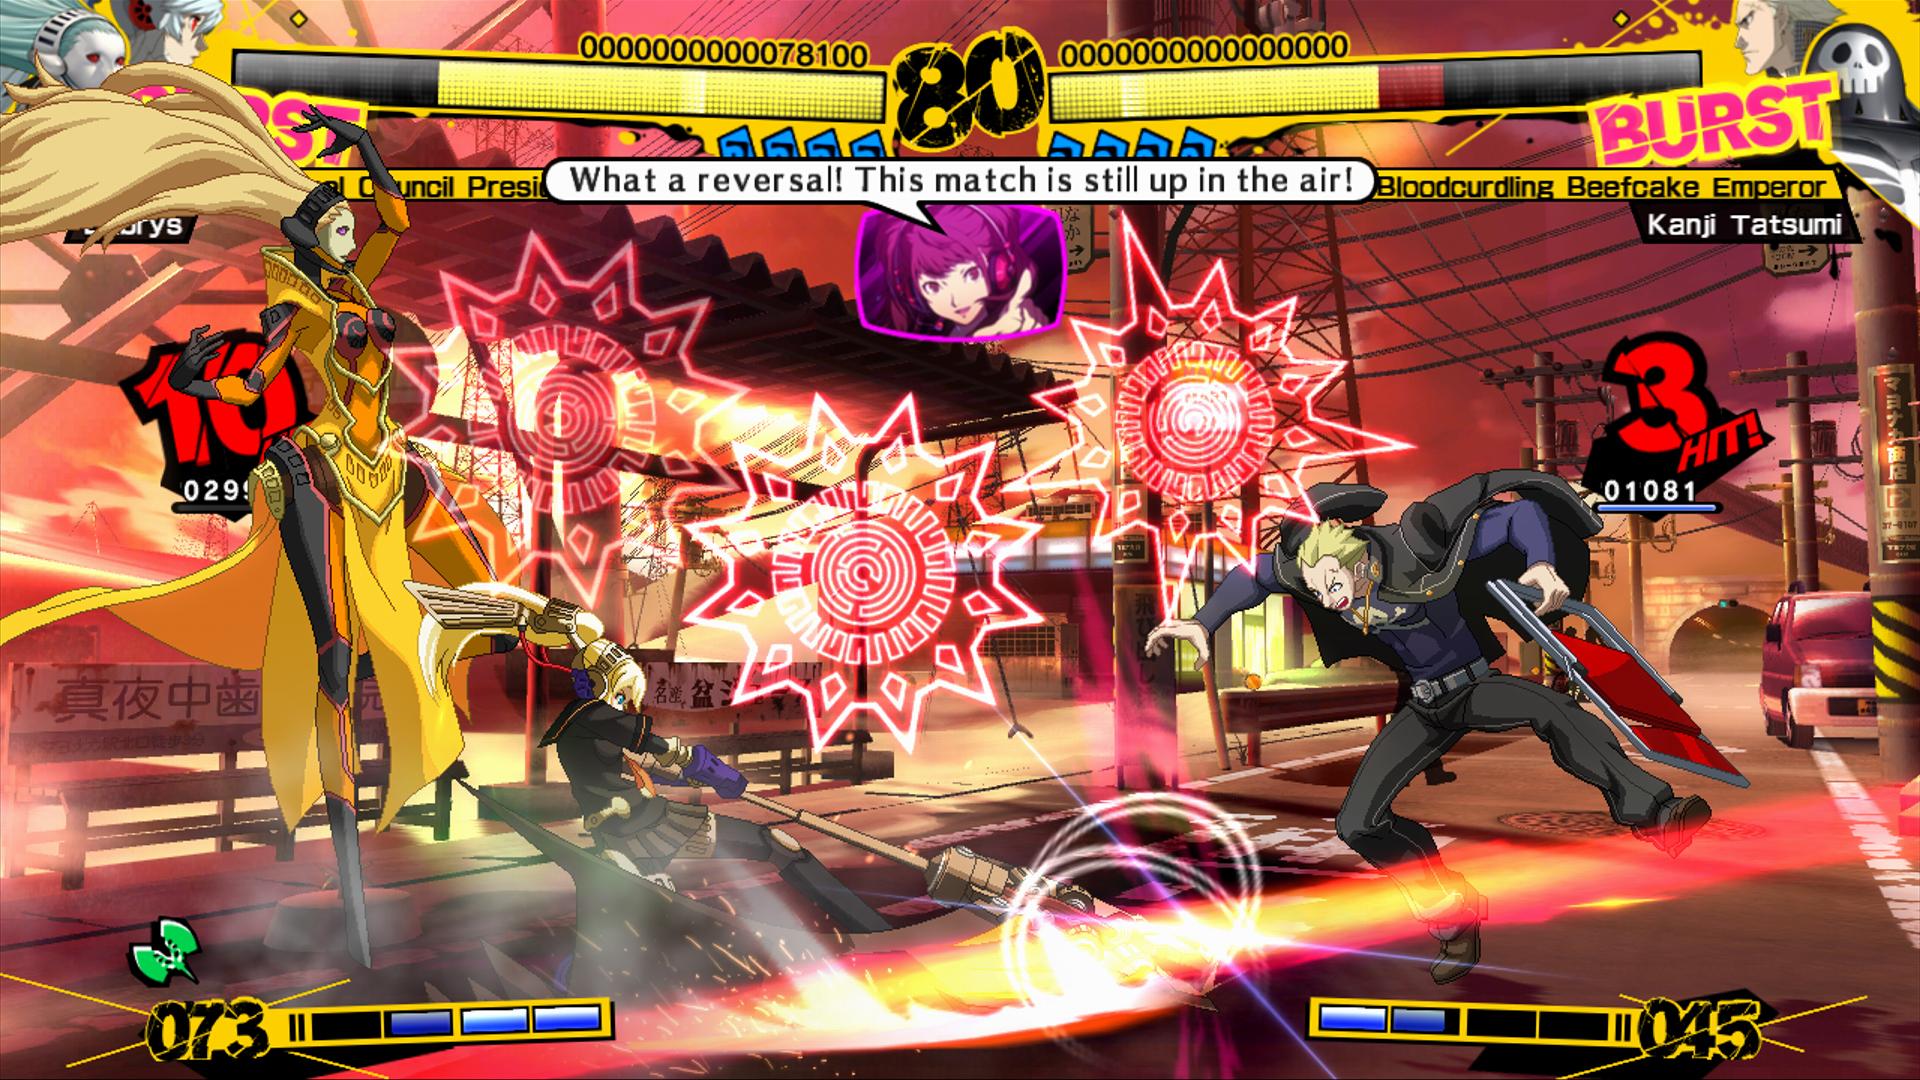 IMAGE(http://www.the-games-blog.com/wp-content/uploads/2012/06/p4a_screens_arcade_street_02.jpg)